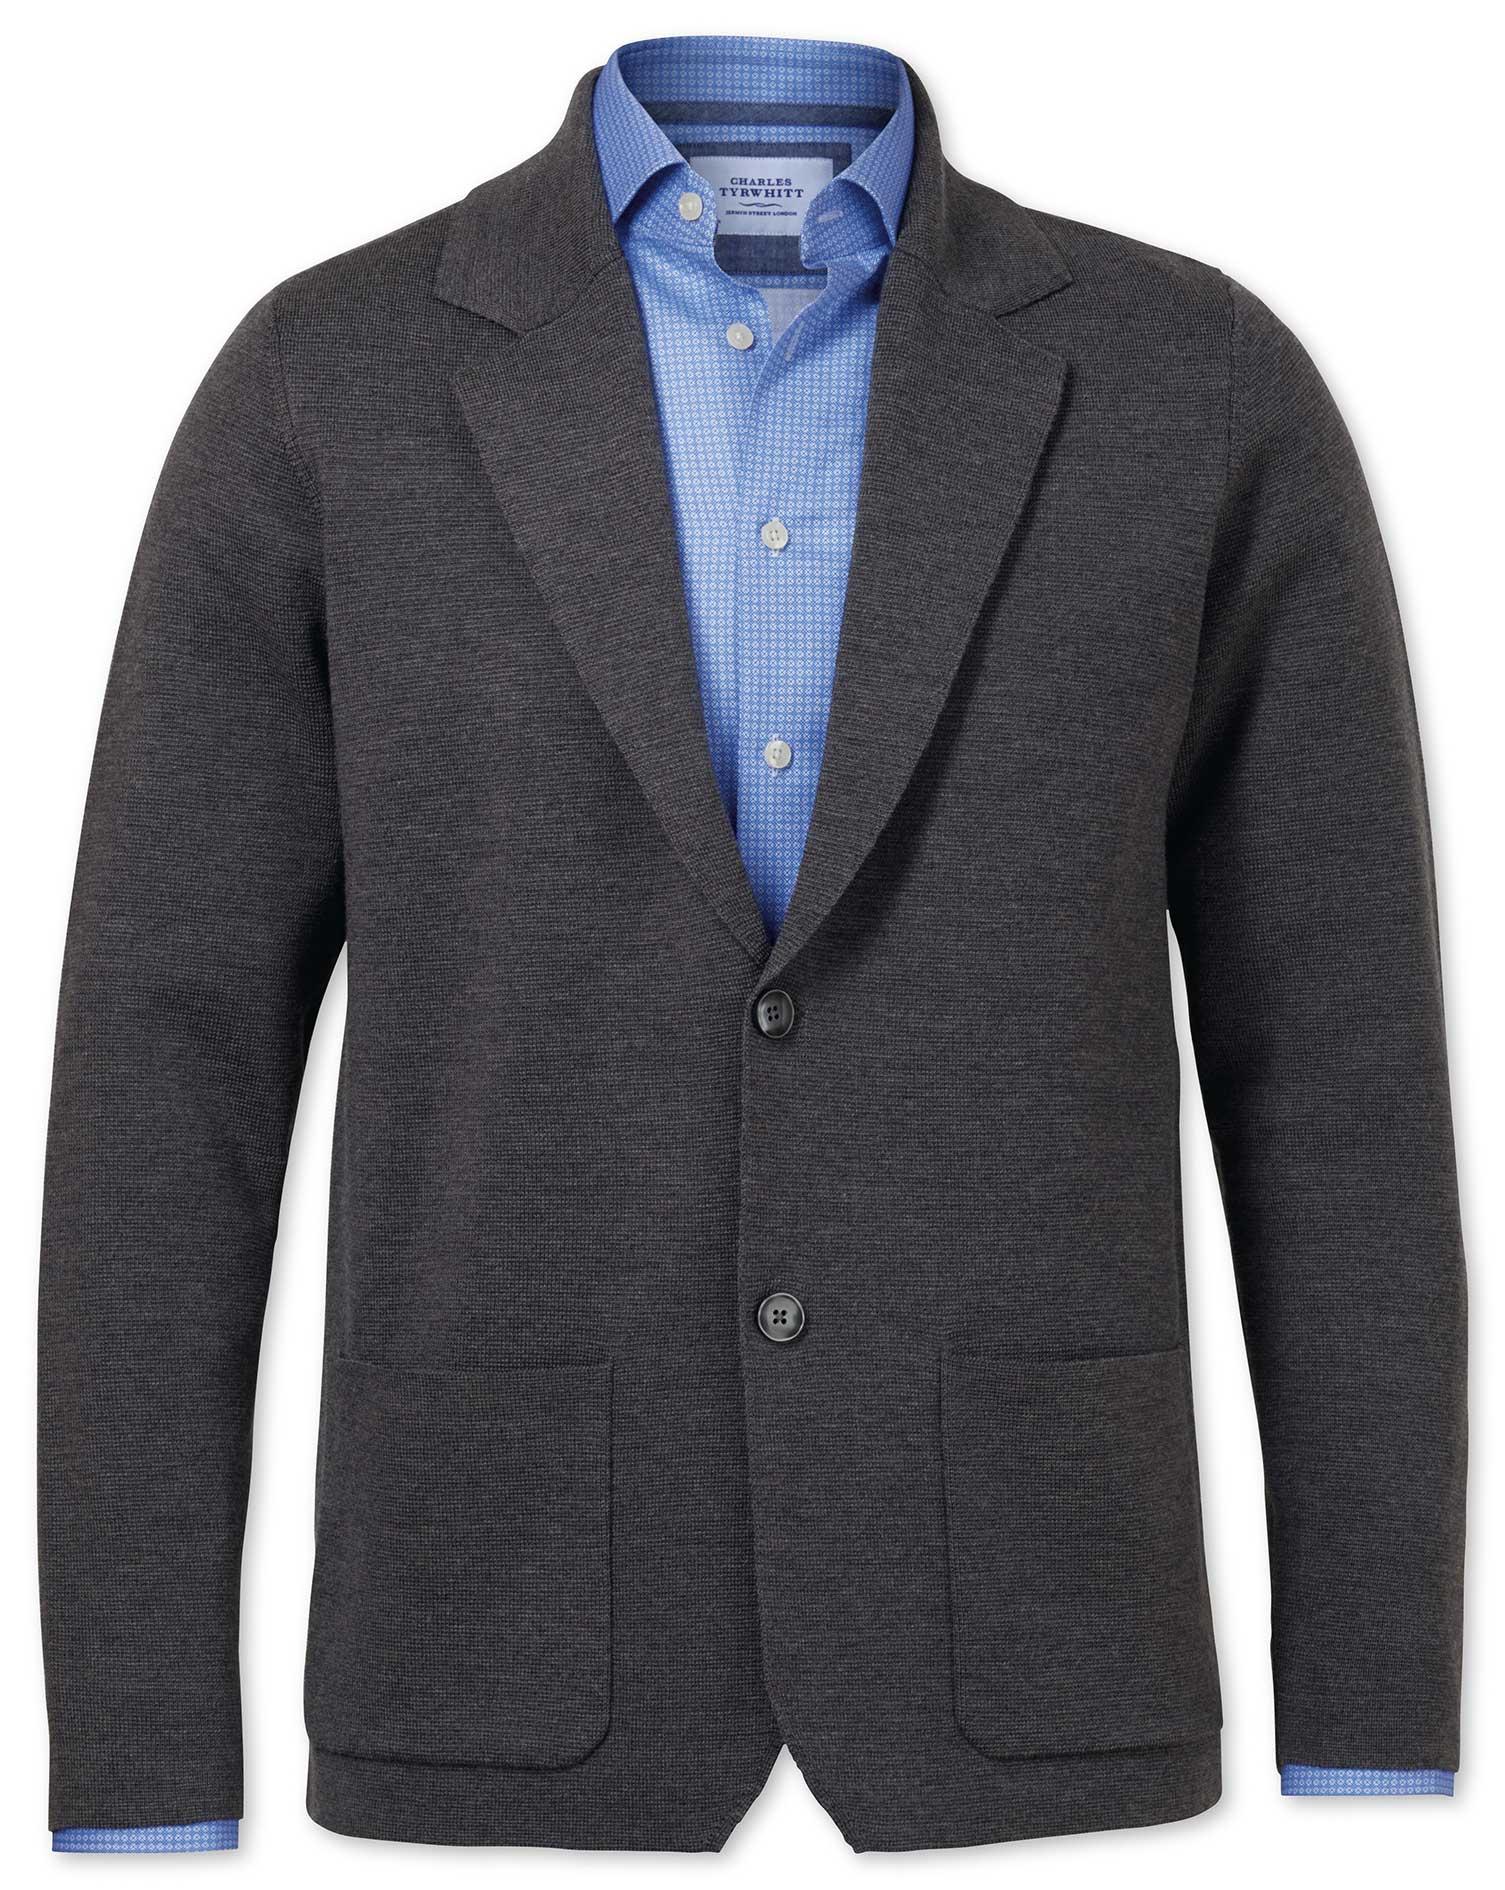 Charcoal Merino Wool Blazer Size Small by Charles Tyrwhitt